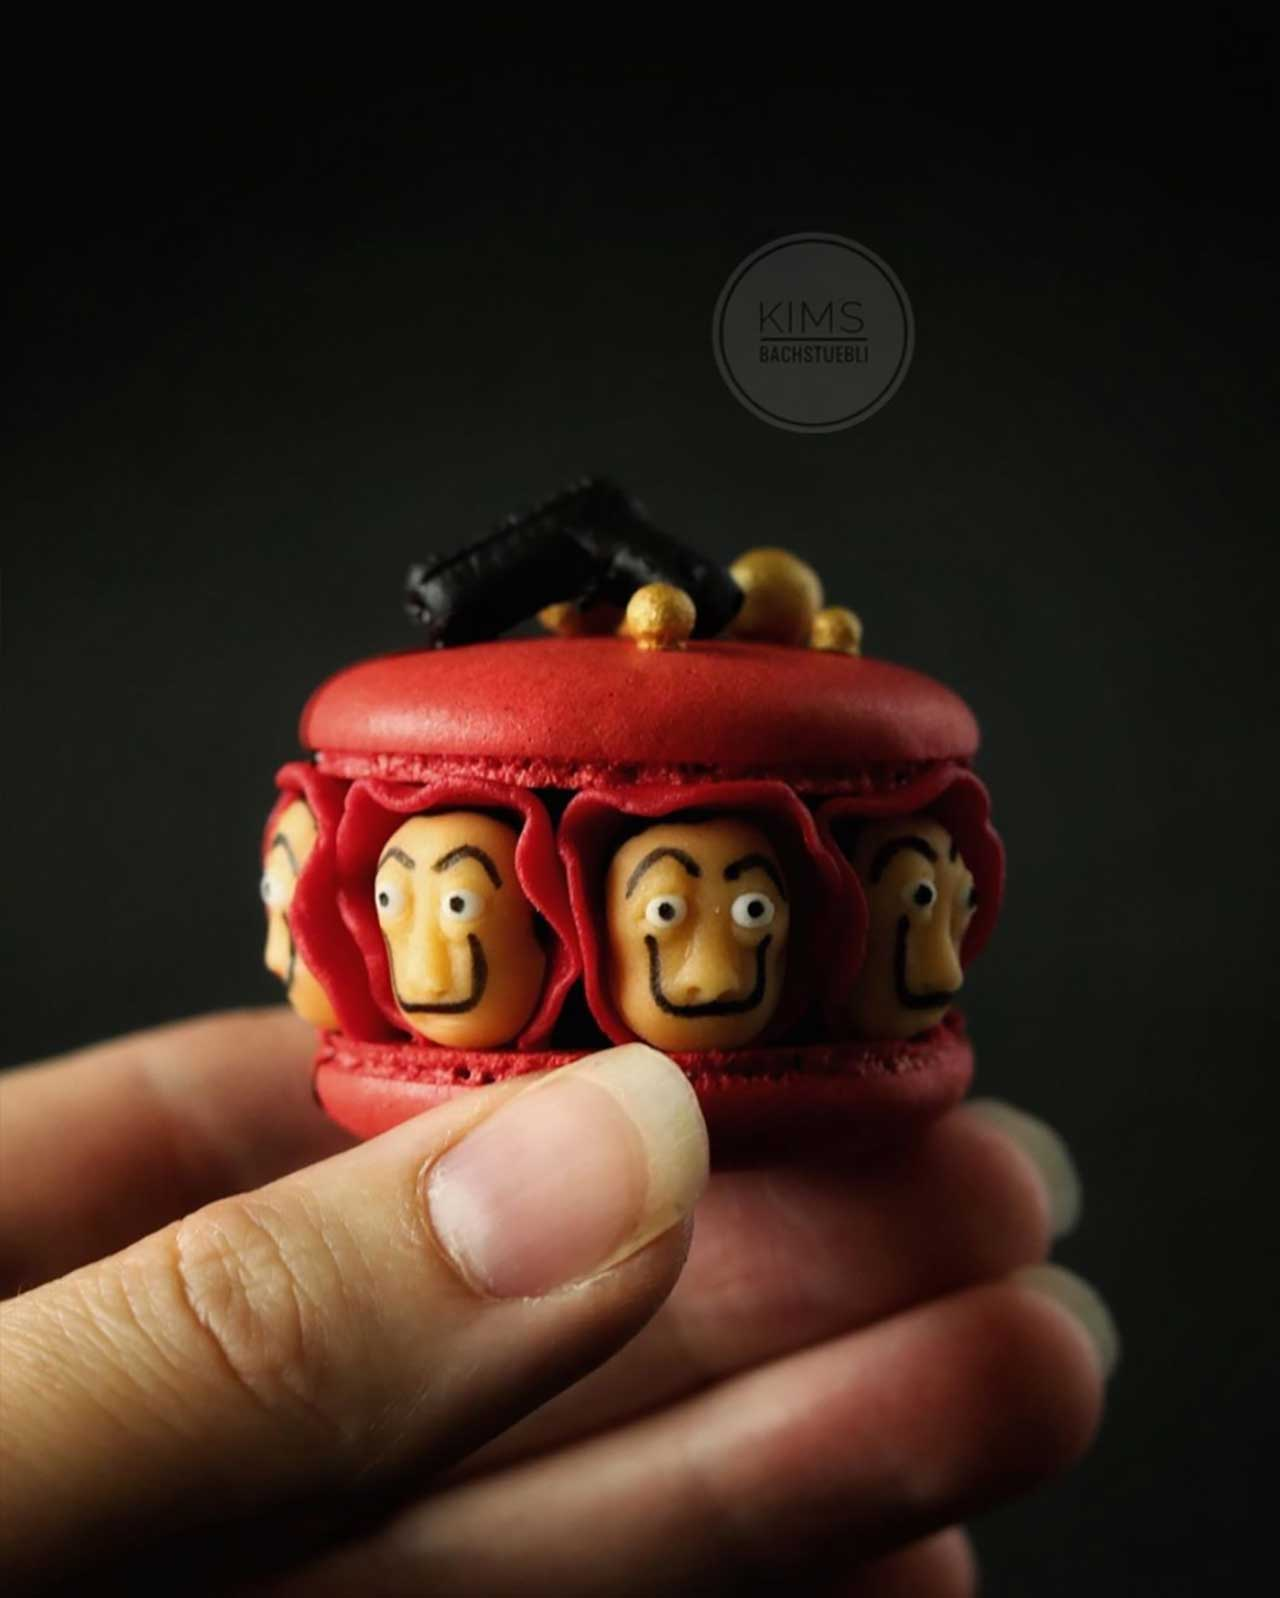 Ausgefallene Macarons aus kims_bachstuebli kim-delia-kims_bachstuebli_09